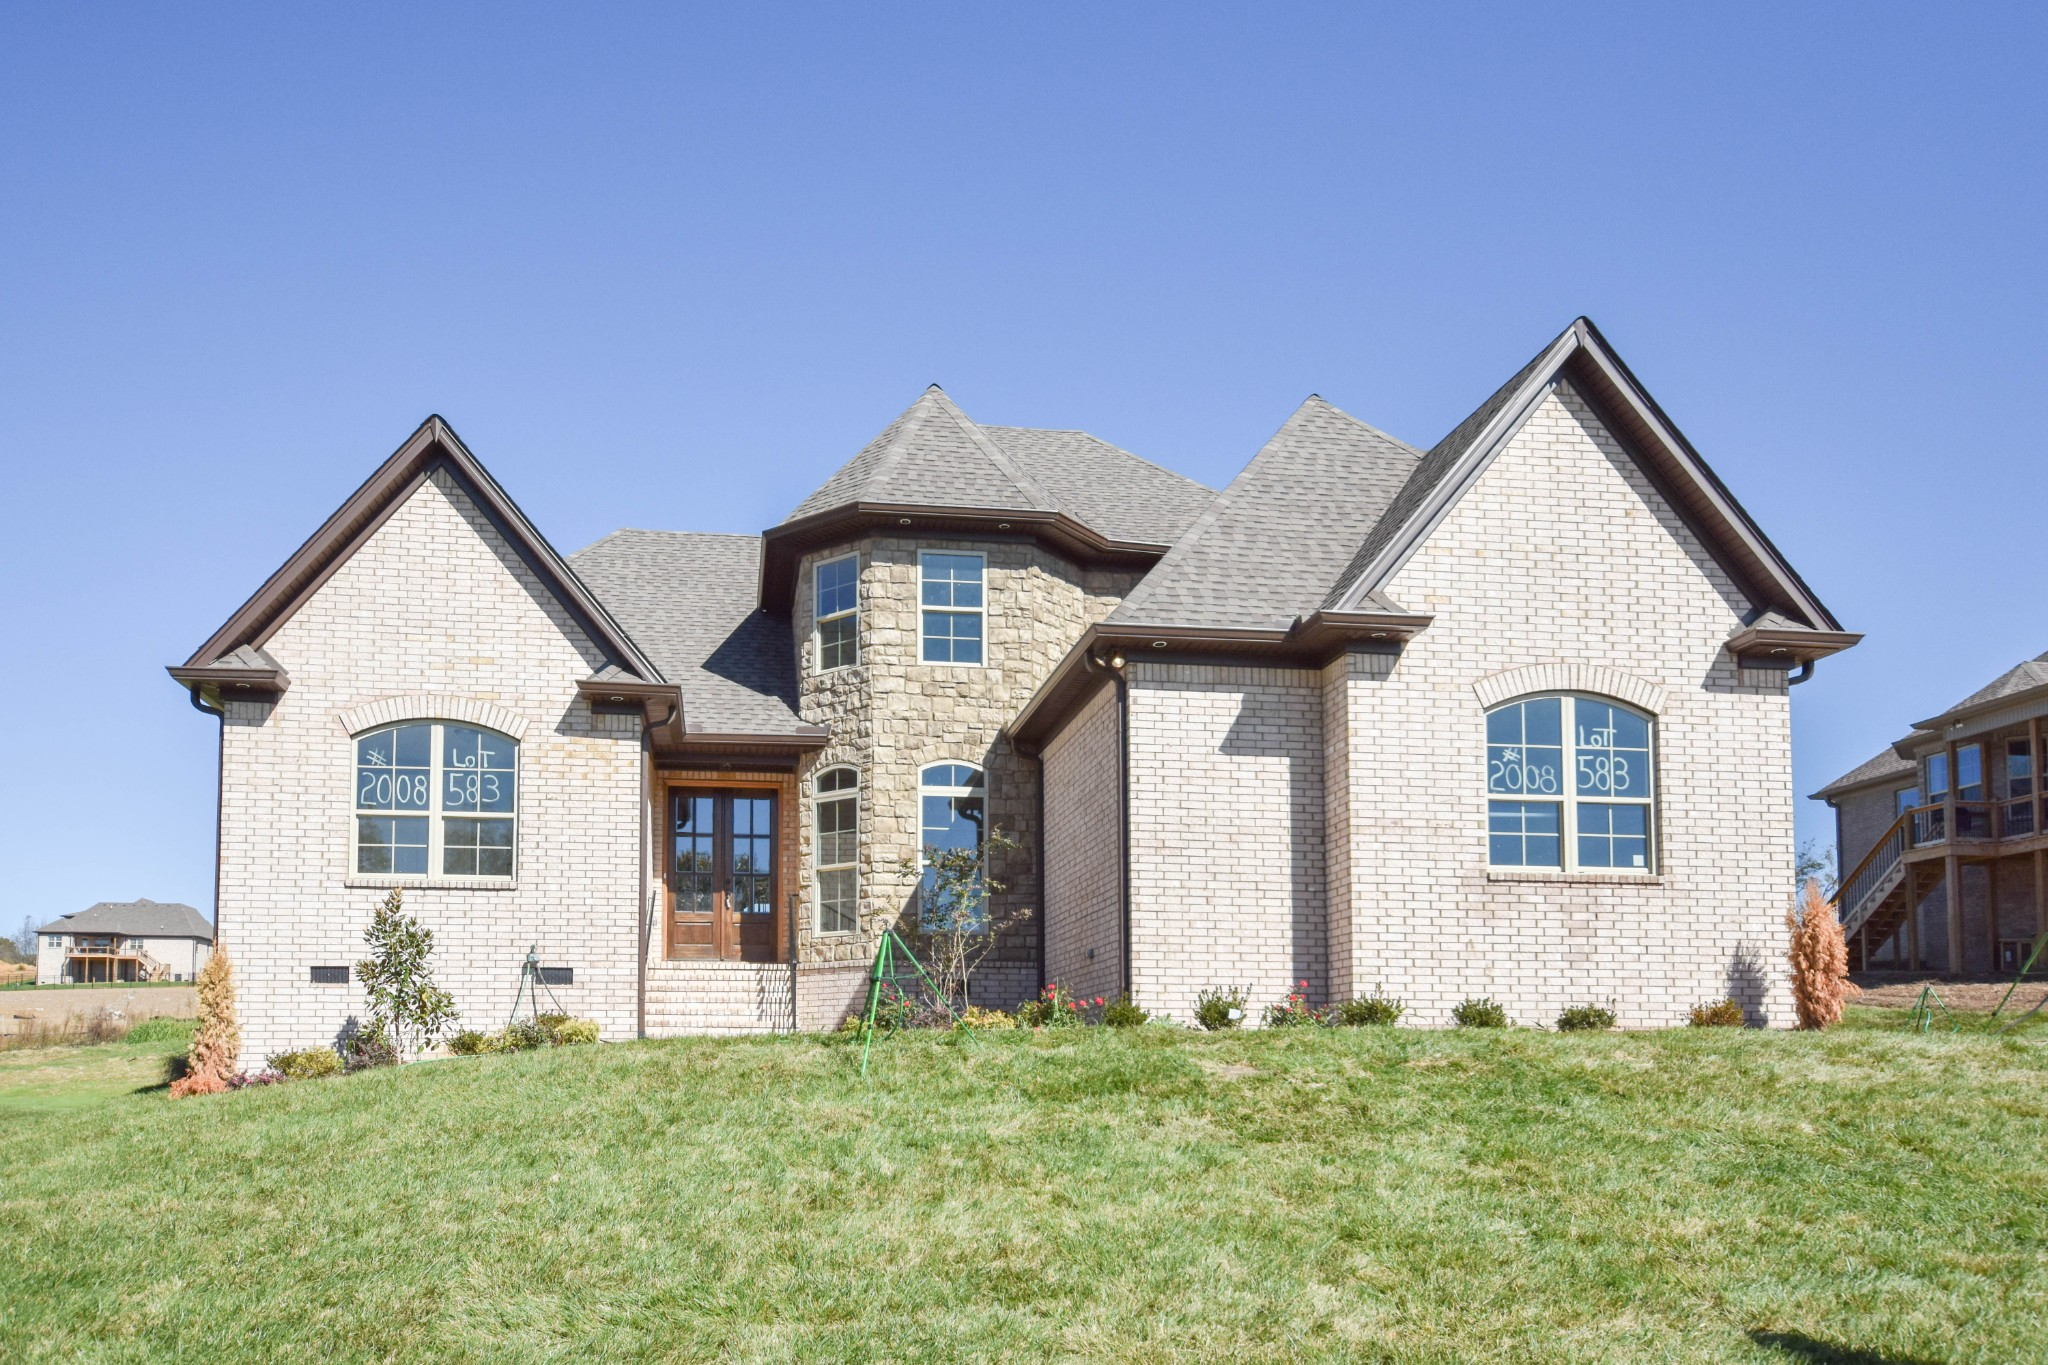 2008 Hawkwell Cir, Hendersonville, TN 37075 - Hendersonville, TN real estate listing